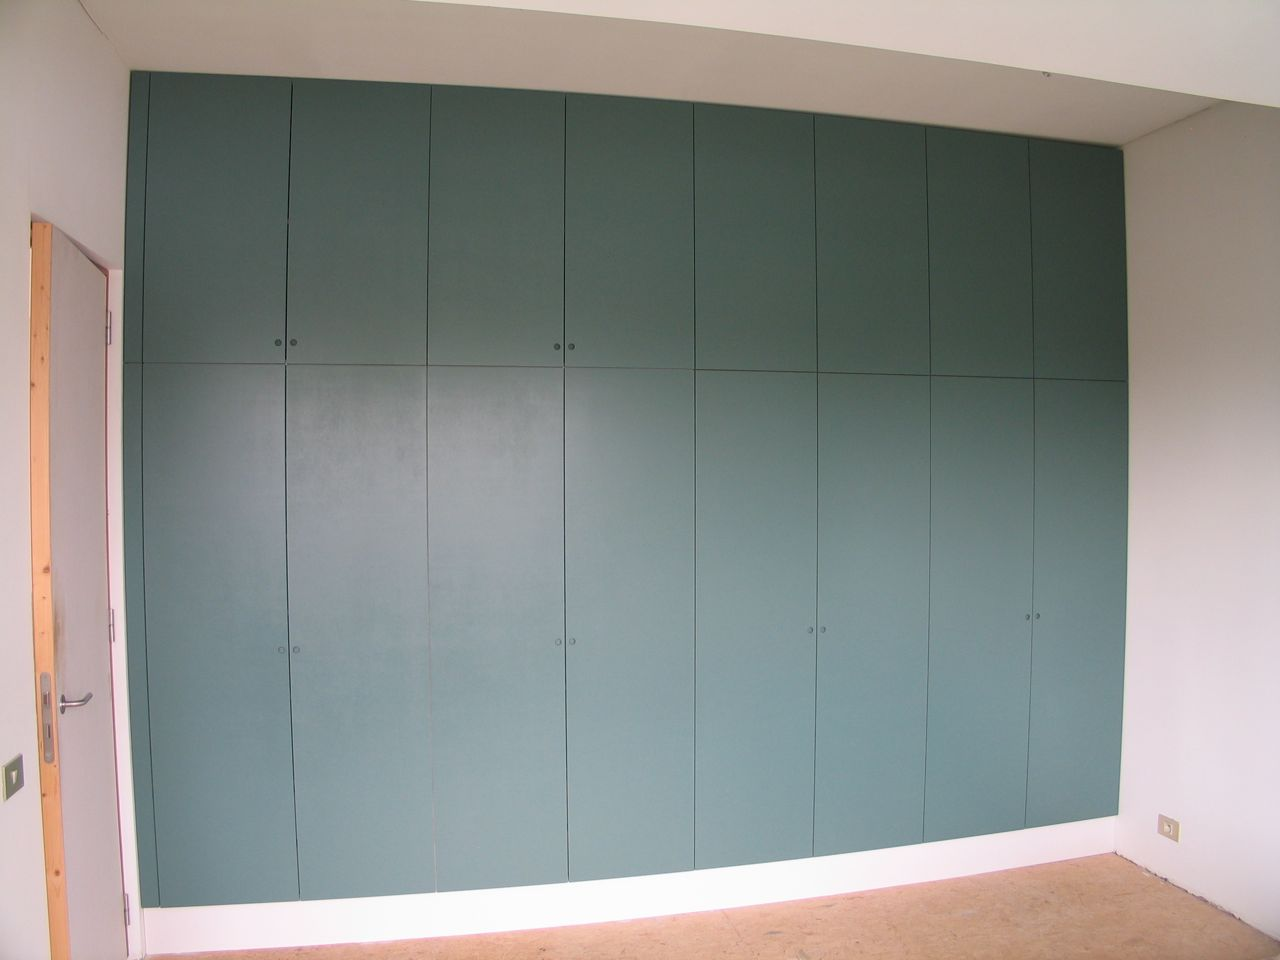 Kast Als Scheidingswand : Een kast als scheidingswand. u2013 frits kuitenbrouwer tailor made furniture